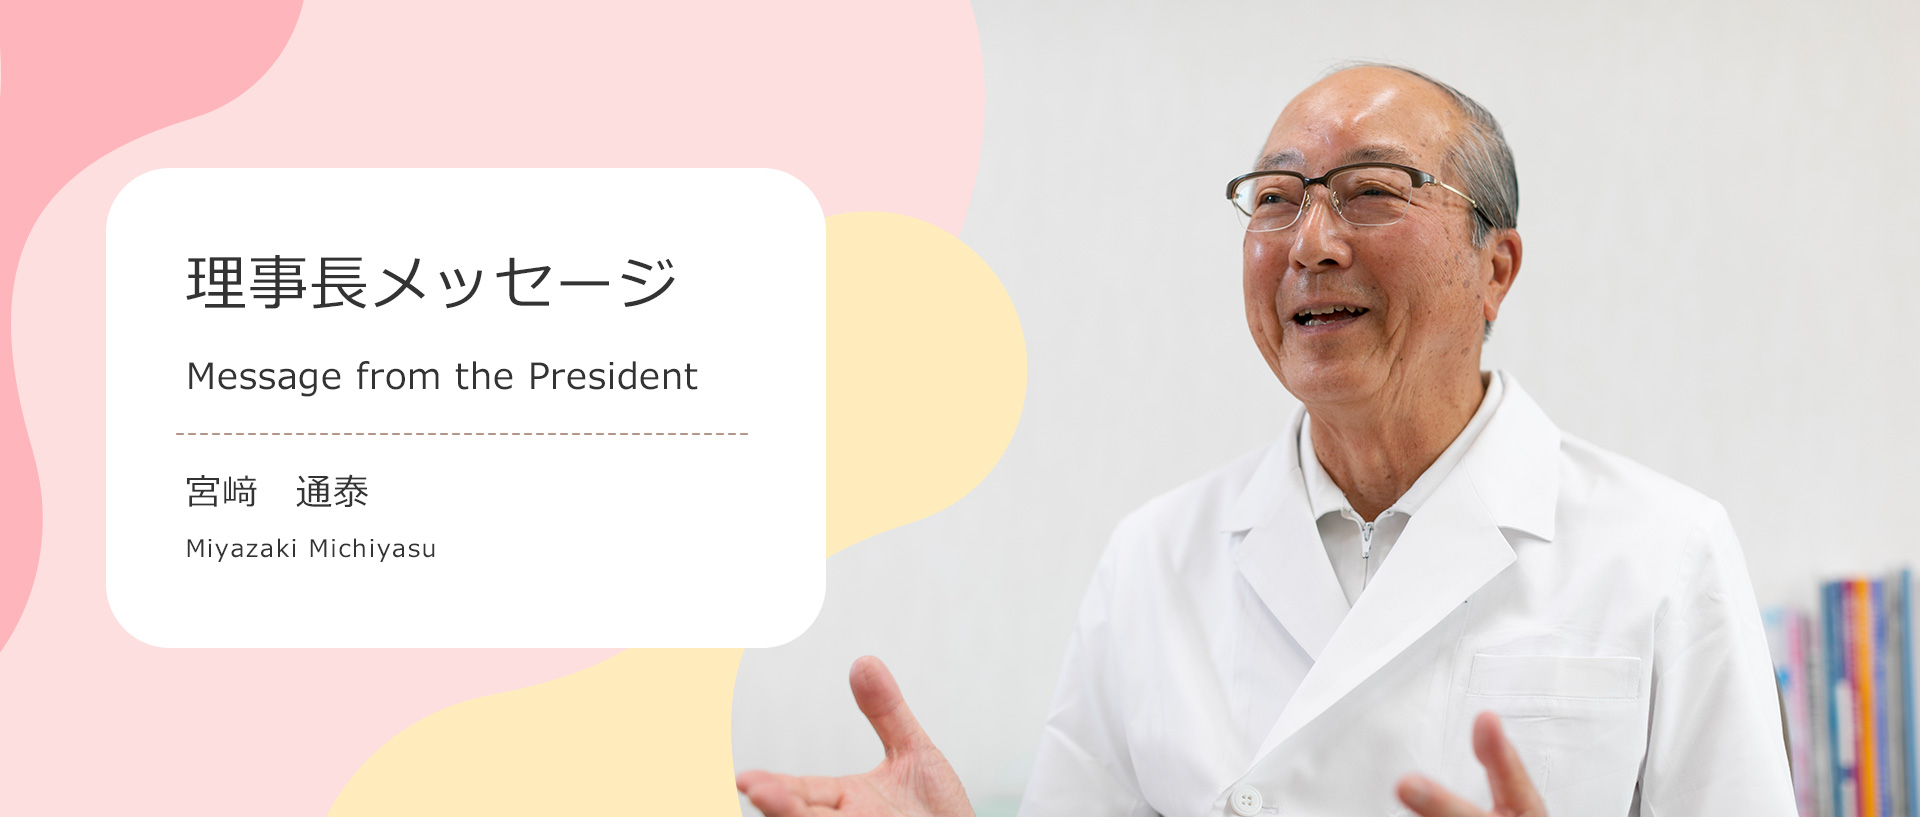 理事長メッセージ 宮﨑 通泰 Miyazaki Michiyasu